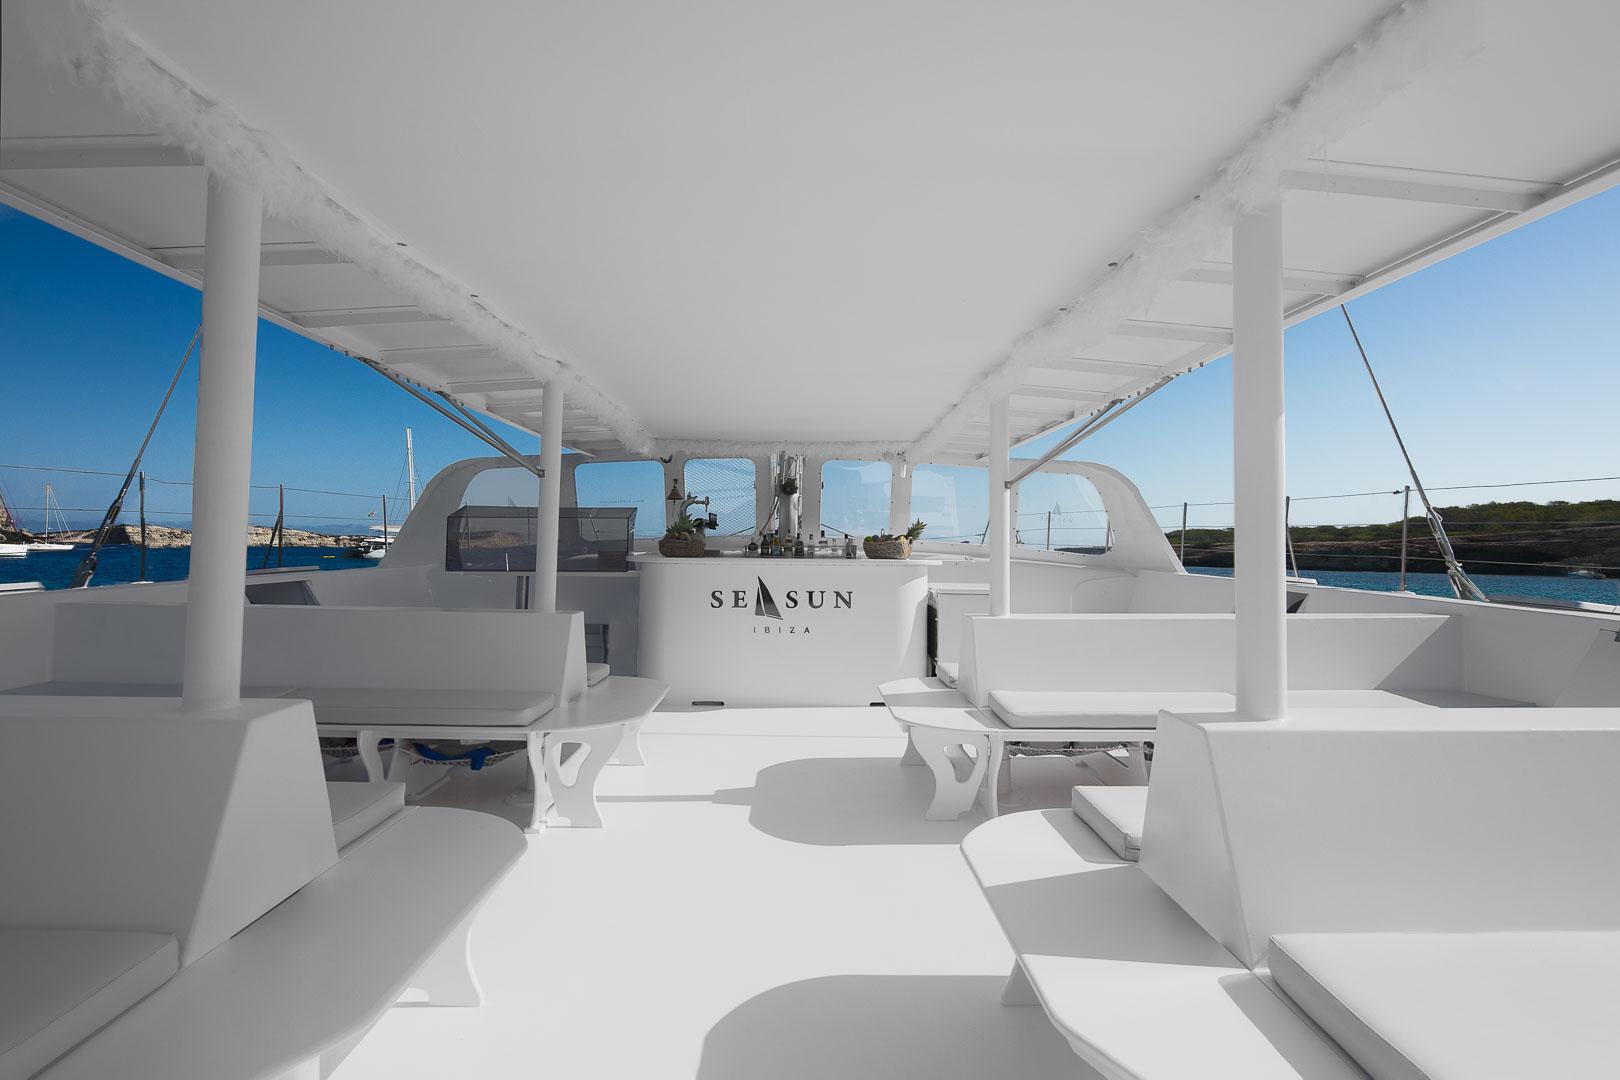 fotografia publicitaria del interior de un catamaran para pasajeros en ibiza